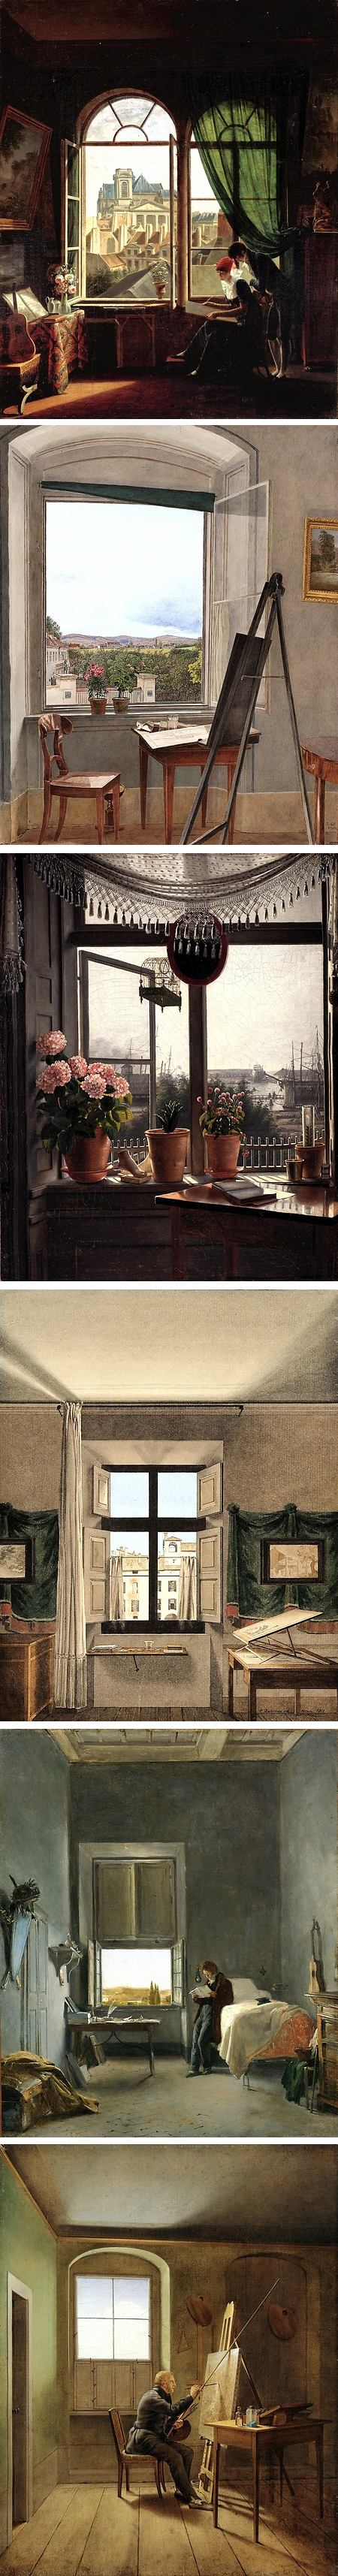 Rooms with a View: The Open Window in the 19th Century: Martin Drolling, Jacob Alt, Martinus Rorbye, Giovanni Battista de Gubernatis, Leon Cogniet, Georg Friedrich Kersting